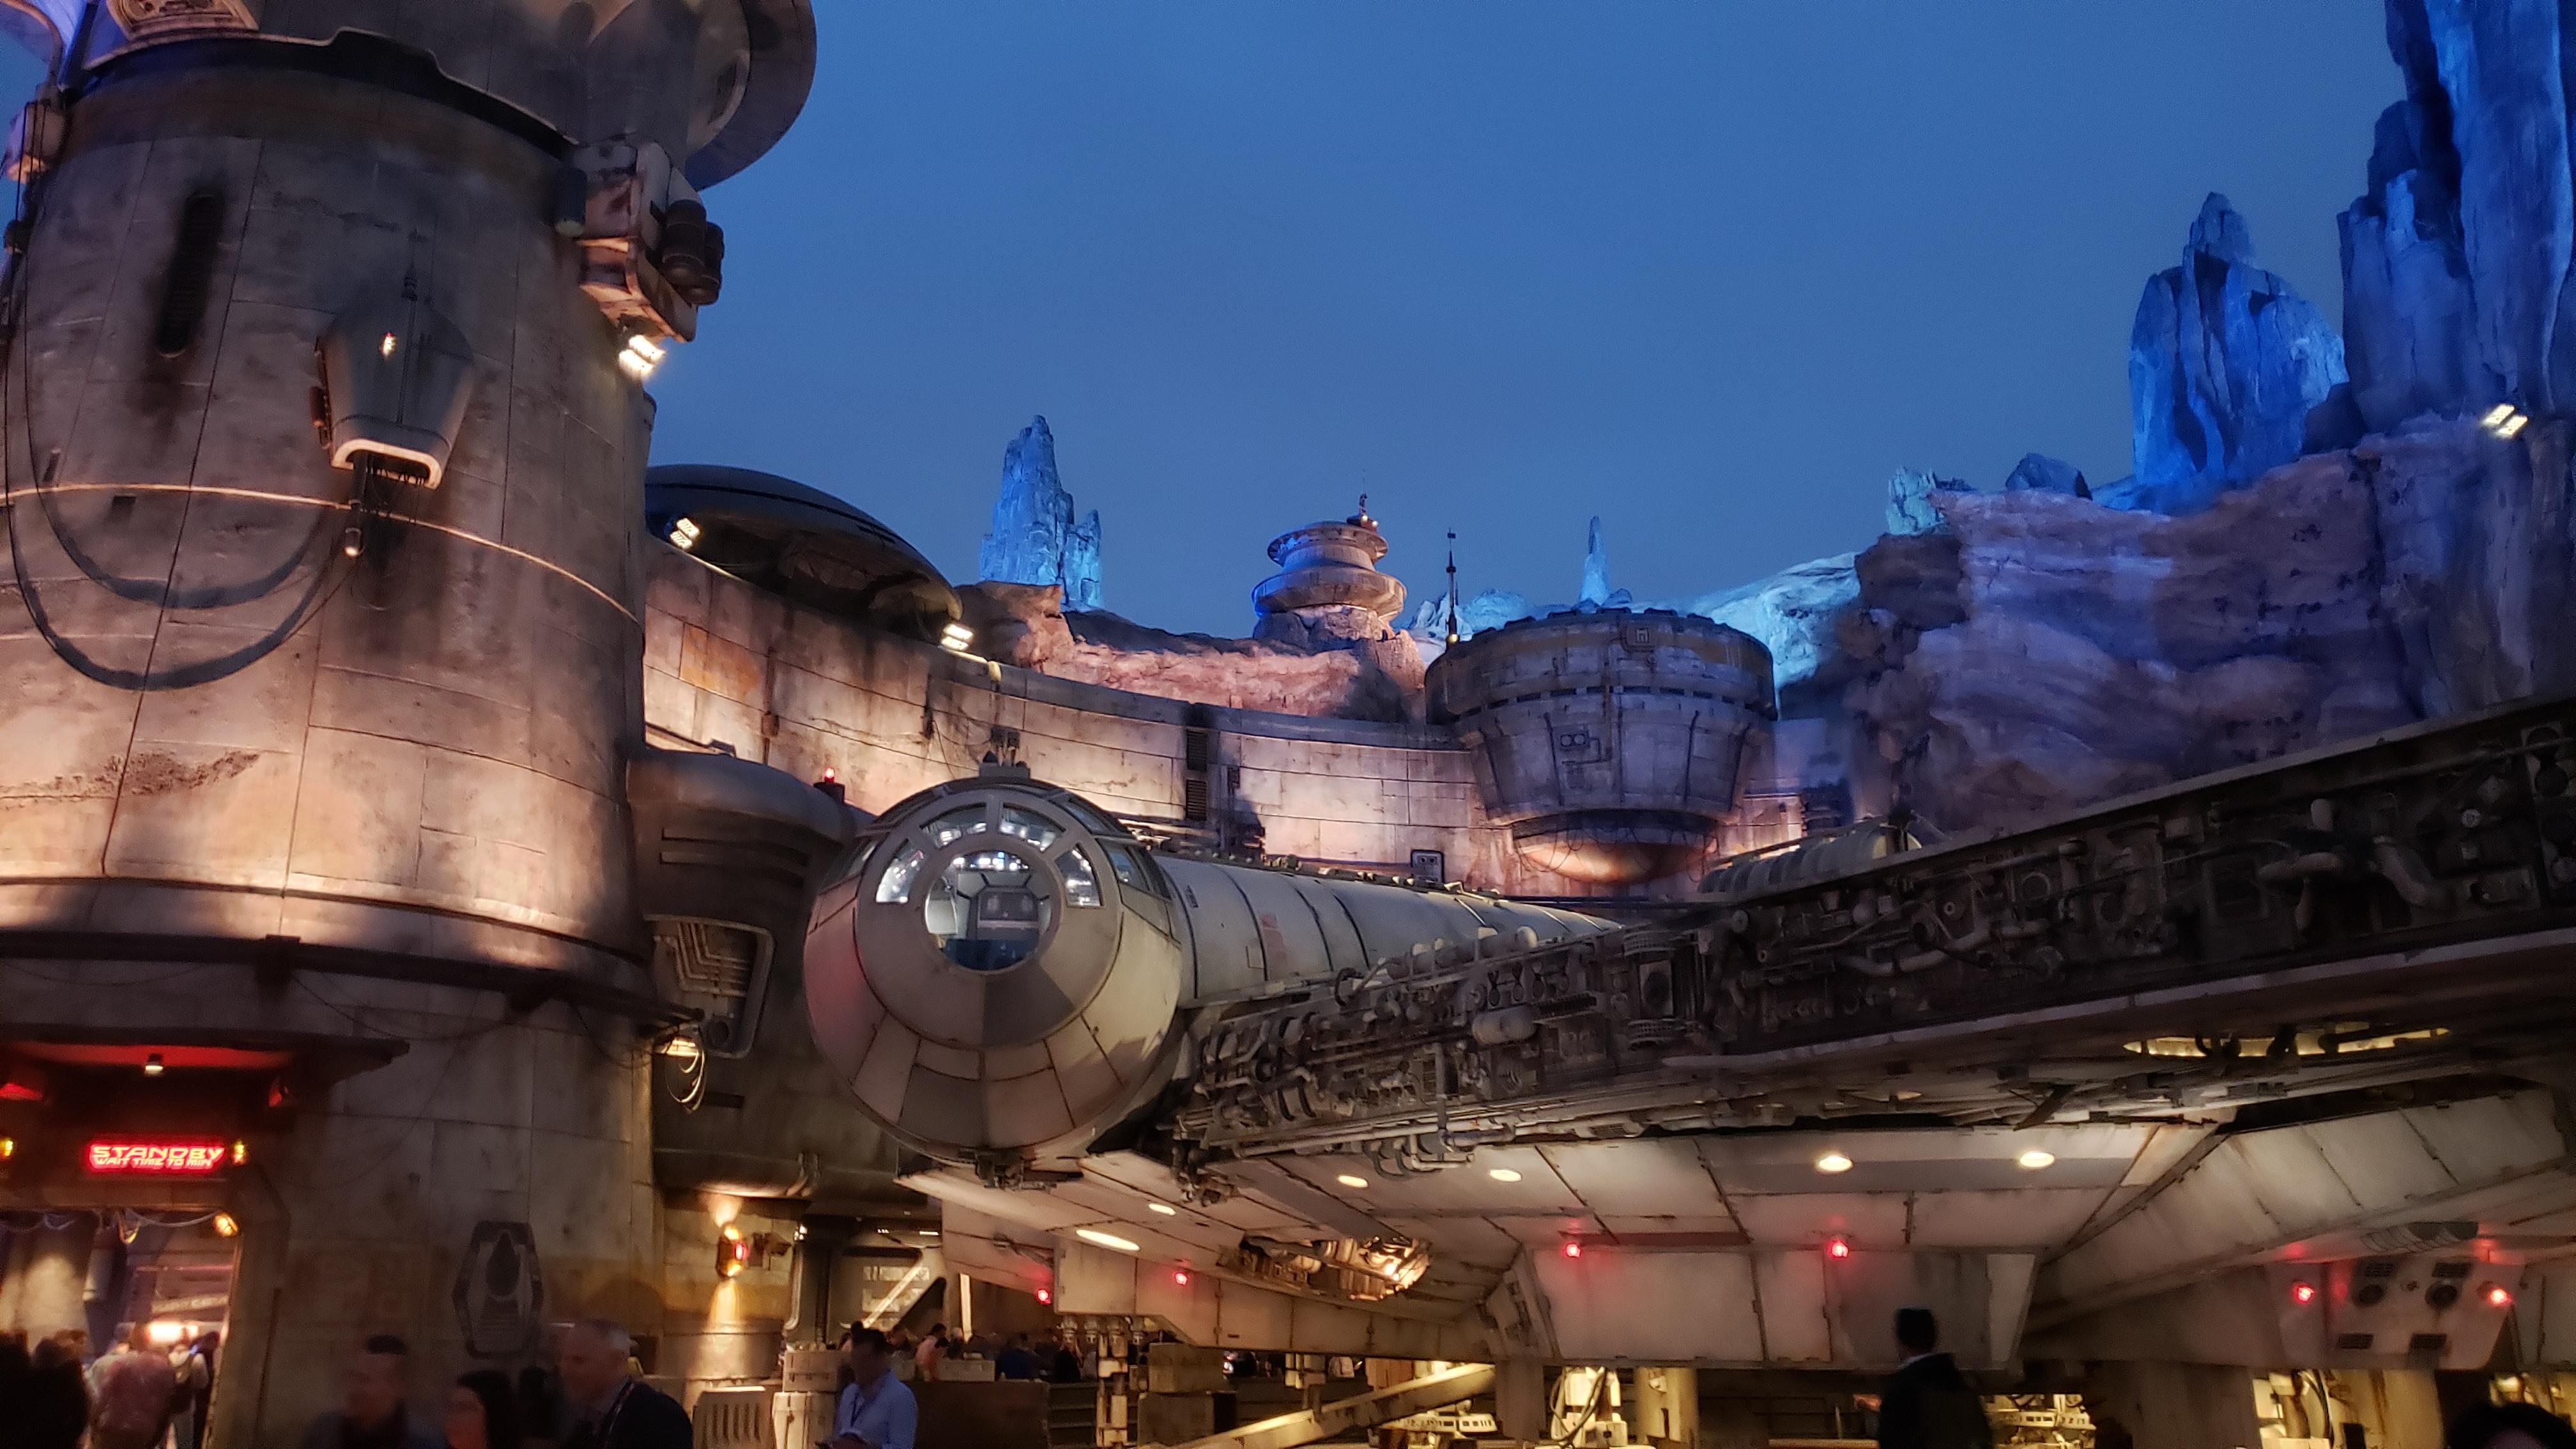 Star Wars: Galaxy's Edge at Walt Disney World Resort in Florida